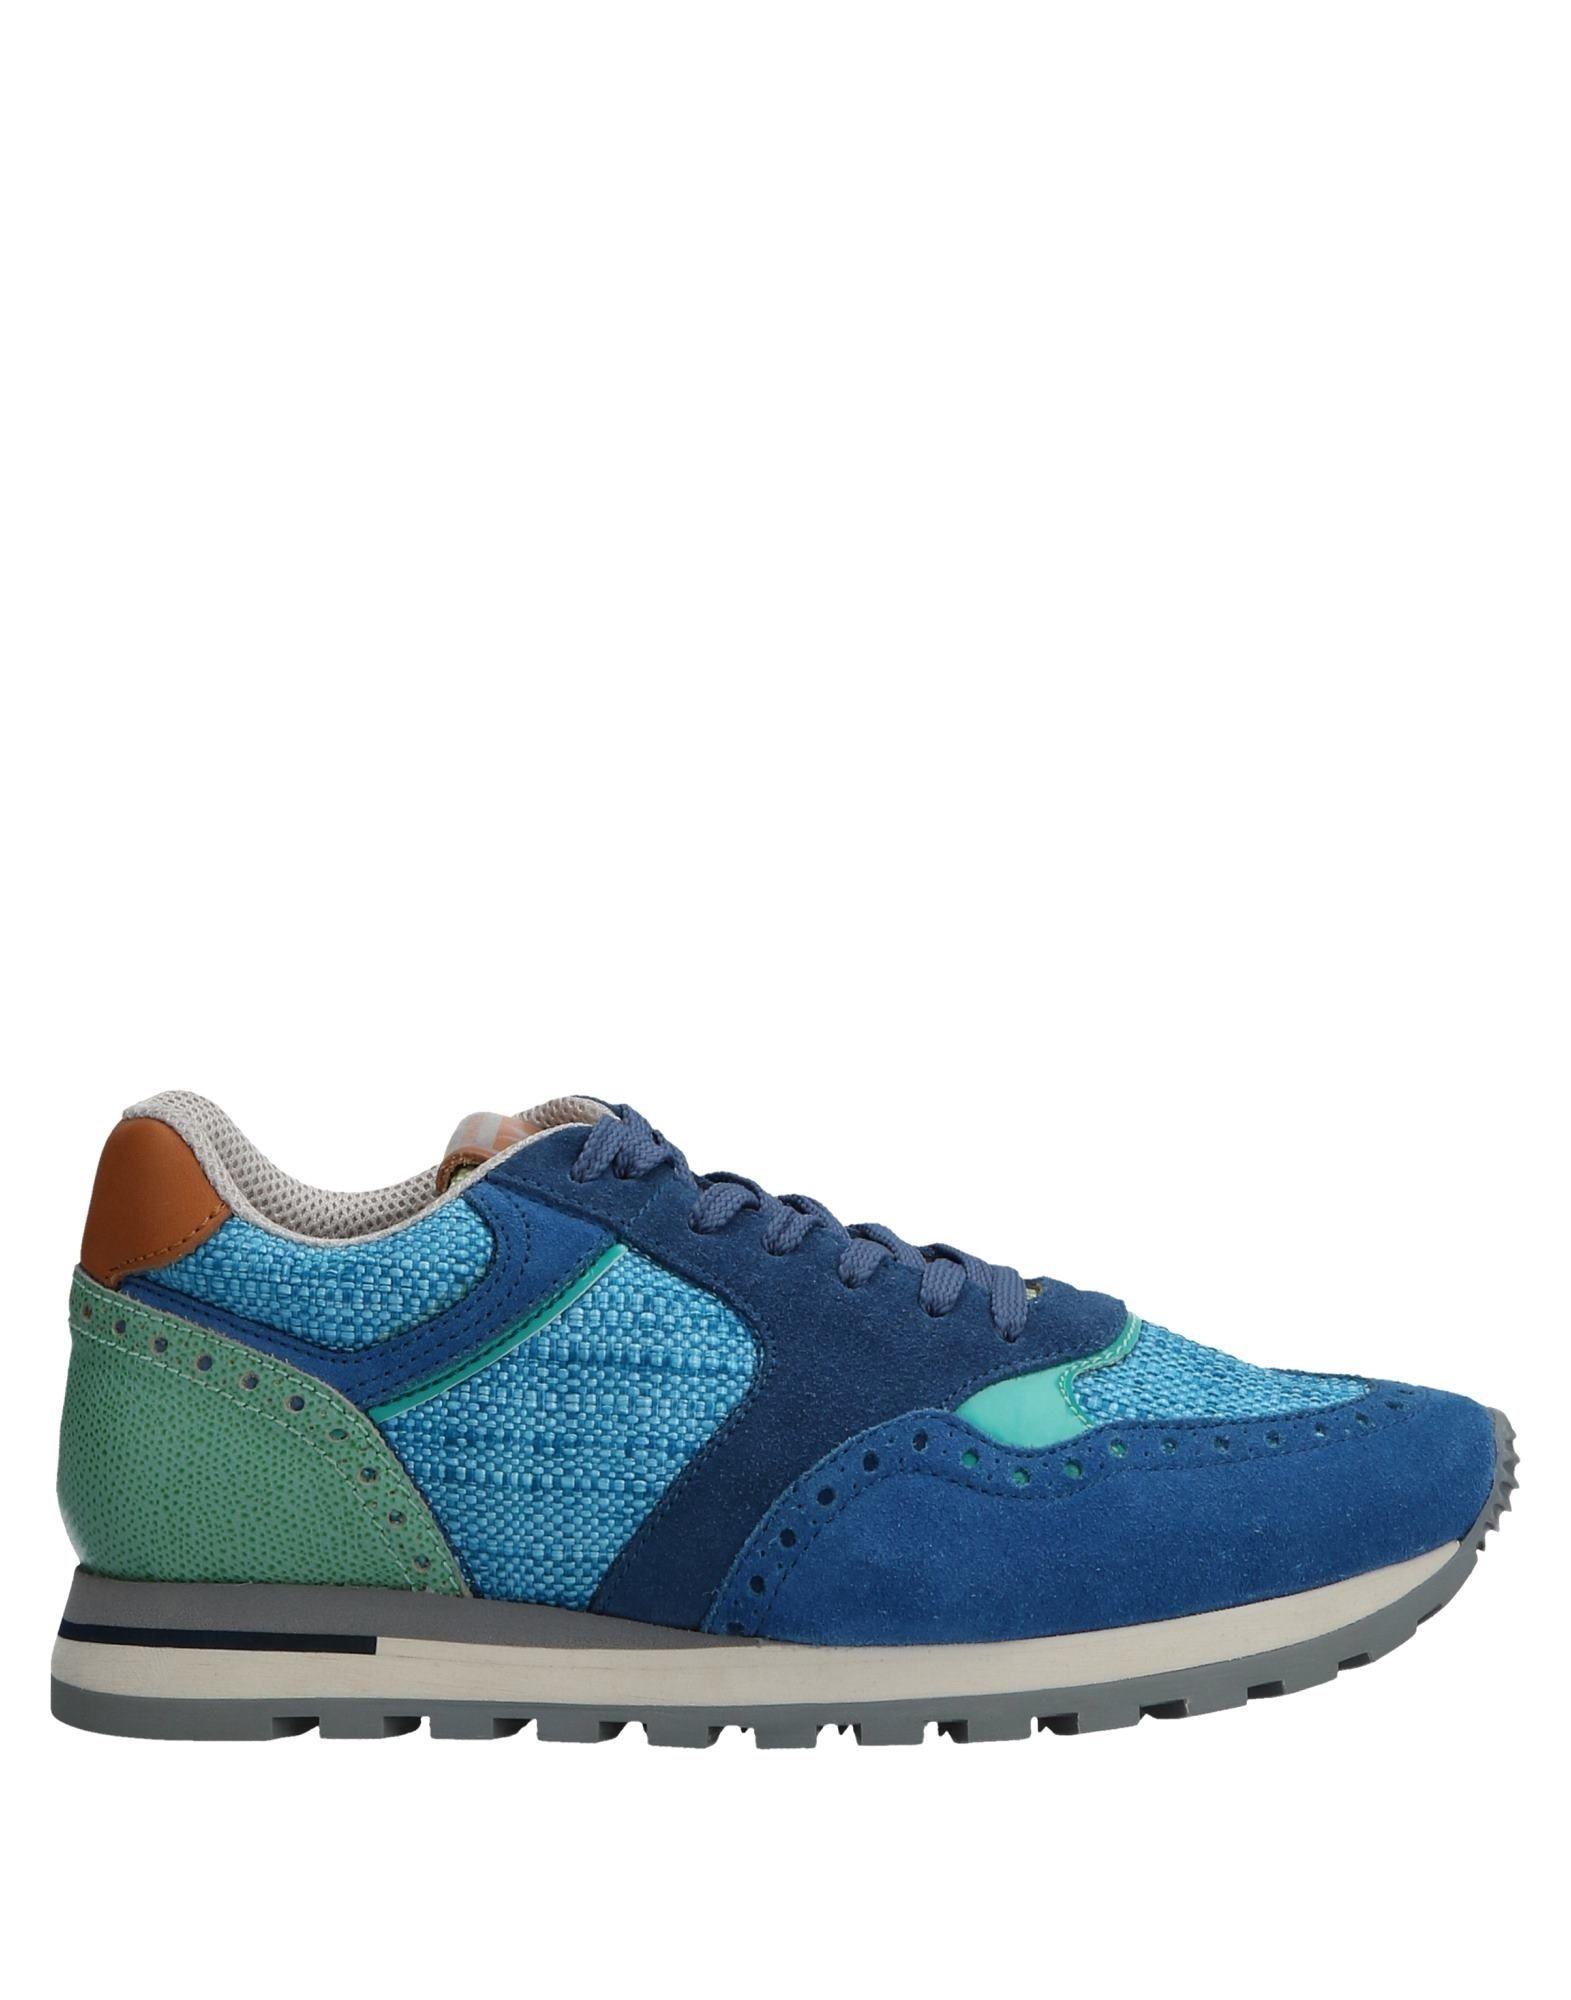 Moda Sneakers Brimarts Uomo - 11531198EK